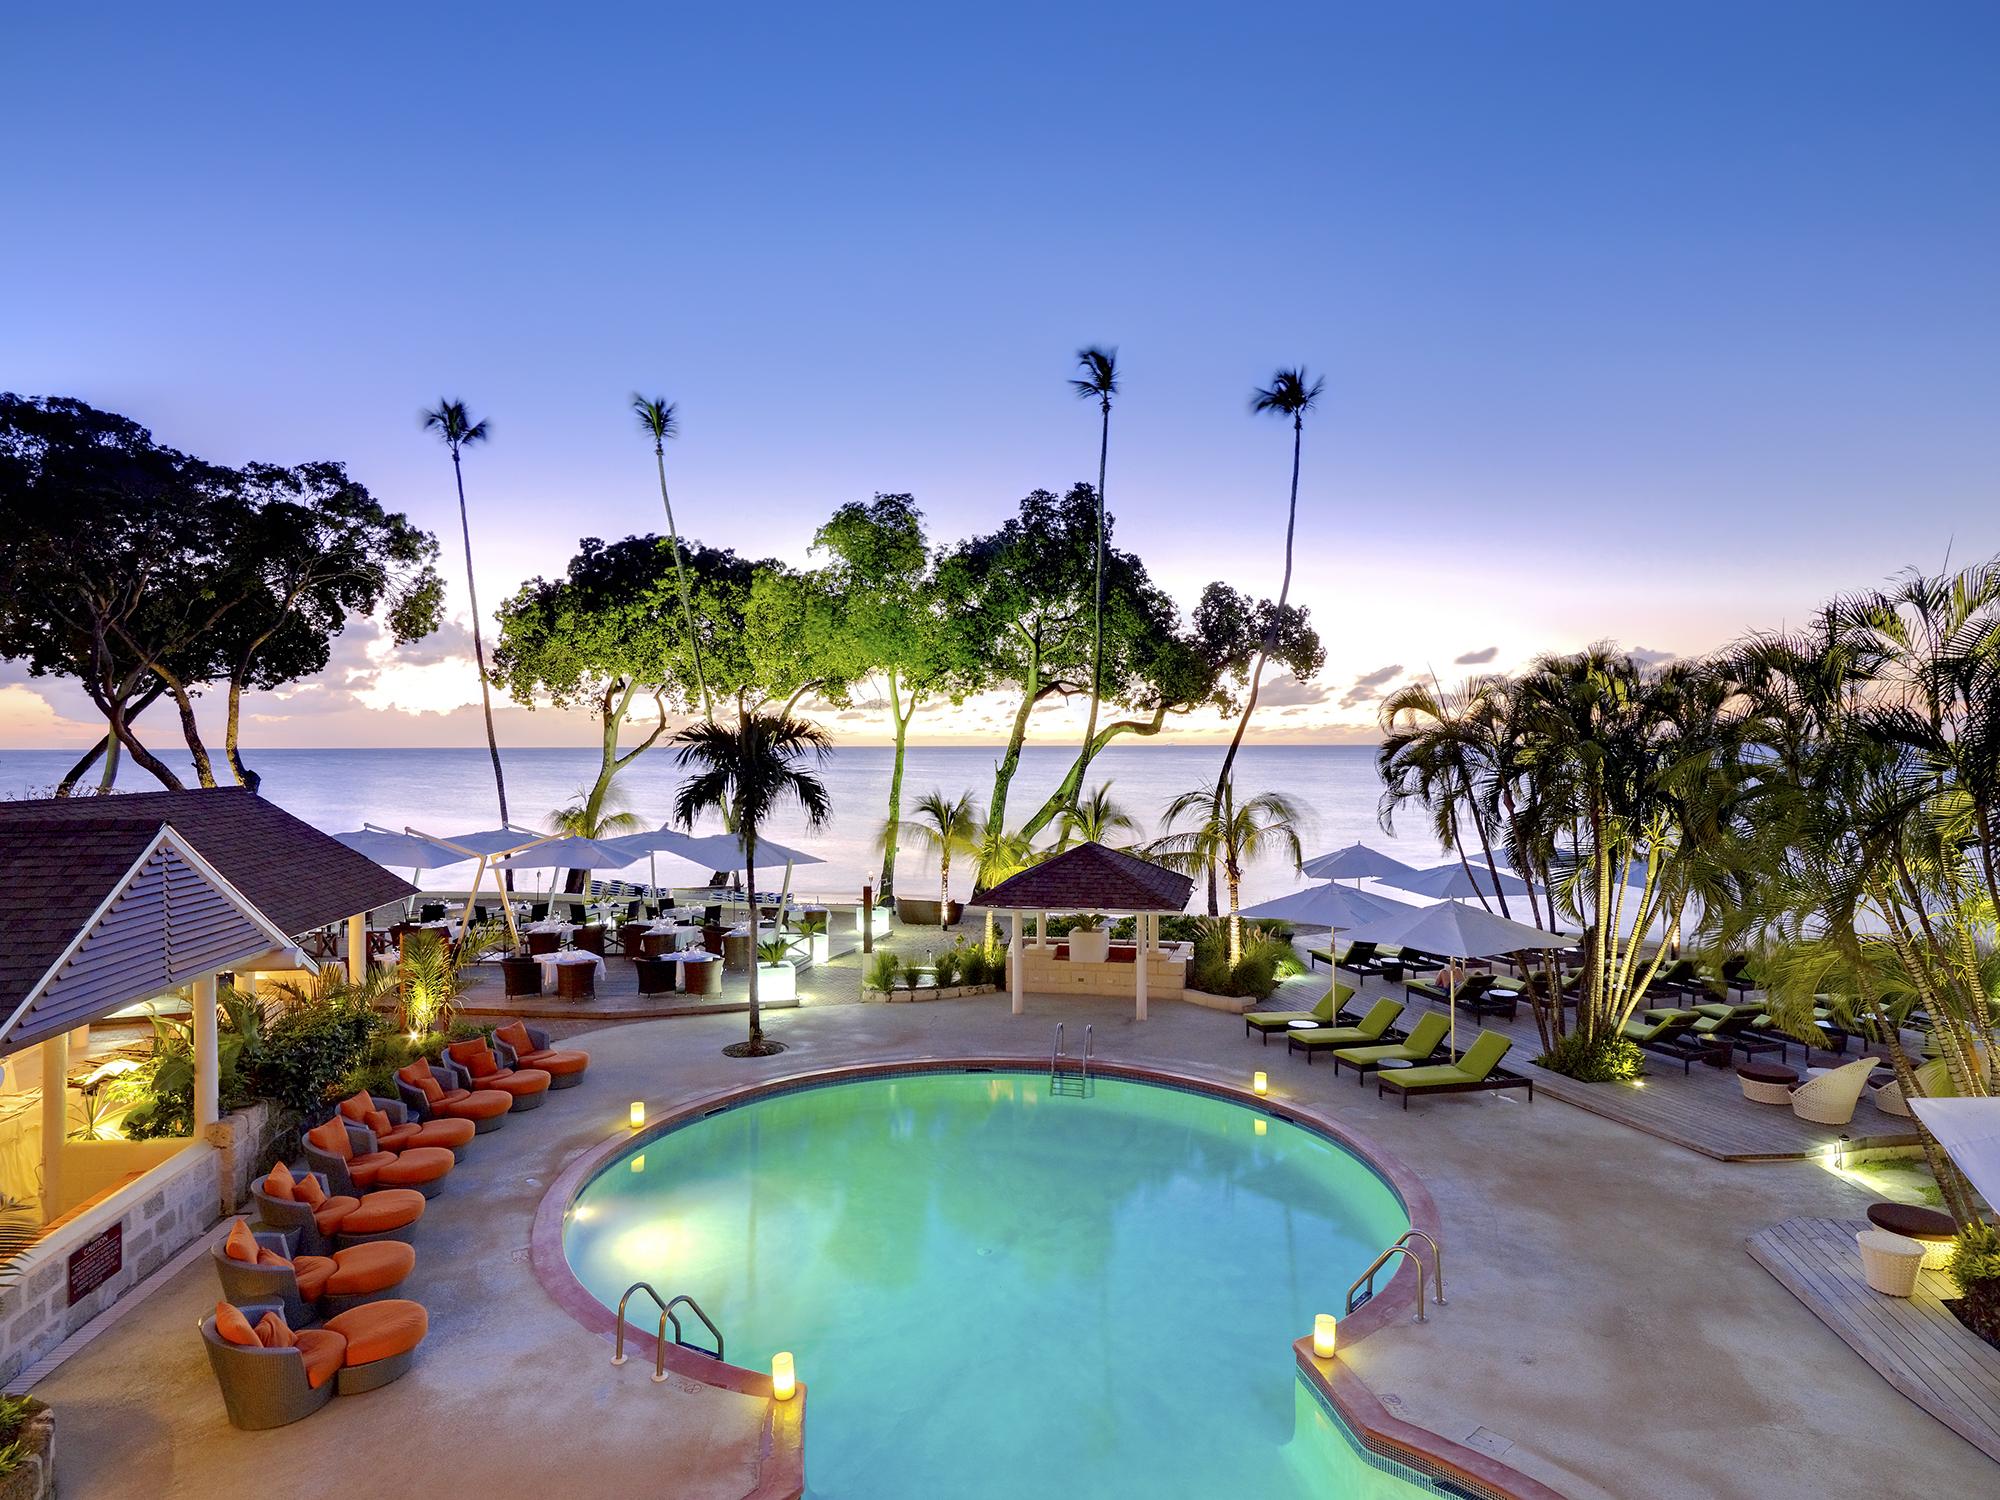 Acraa Beach Hotel, Barbados